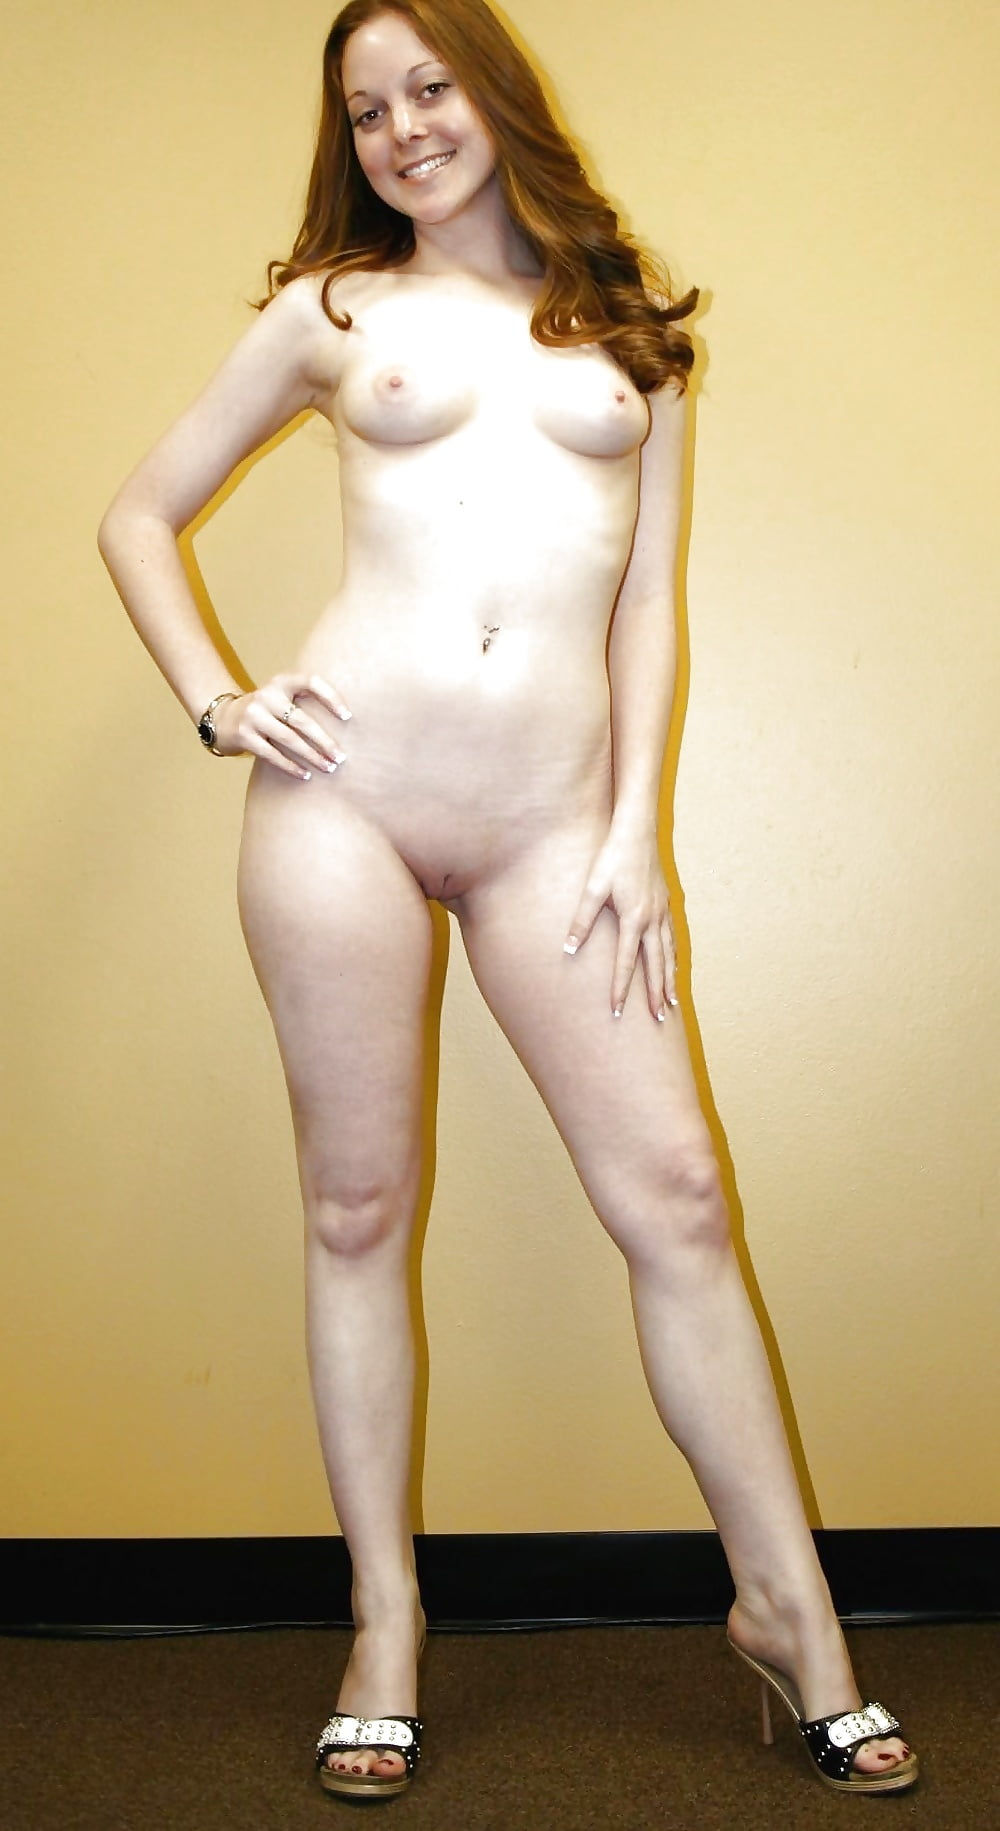 Scarlett fay nude nude — img 2